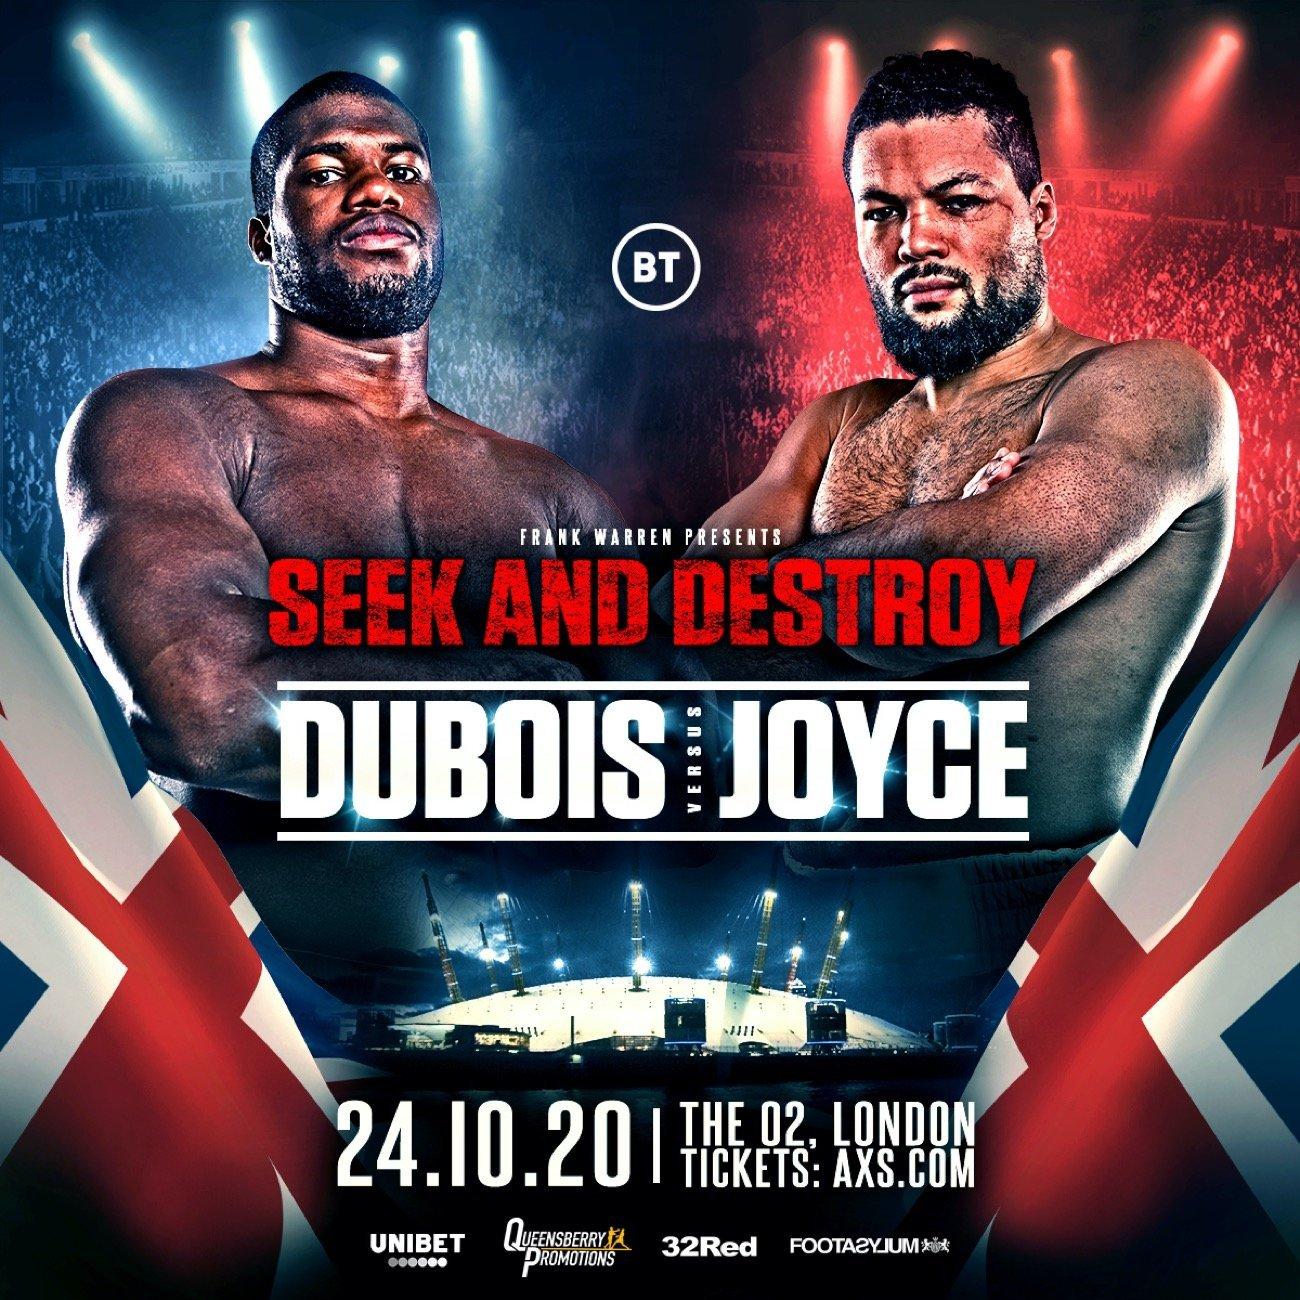 Daniel Dubois - BRITISH boxing's Heavyweight super-fight between unbeaten KO Kings 'Dynamite' Daniel Dubois and 'Juggernaut' Joe Joyce will now take place at The 02 Arena, London on Saturday October 24.